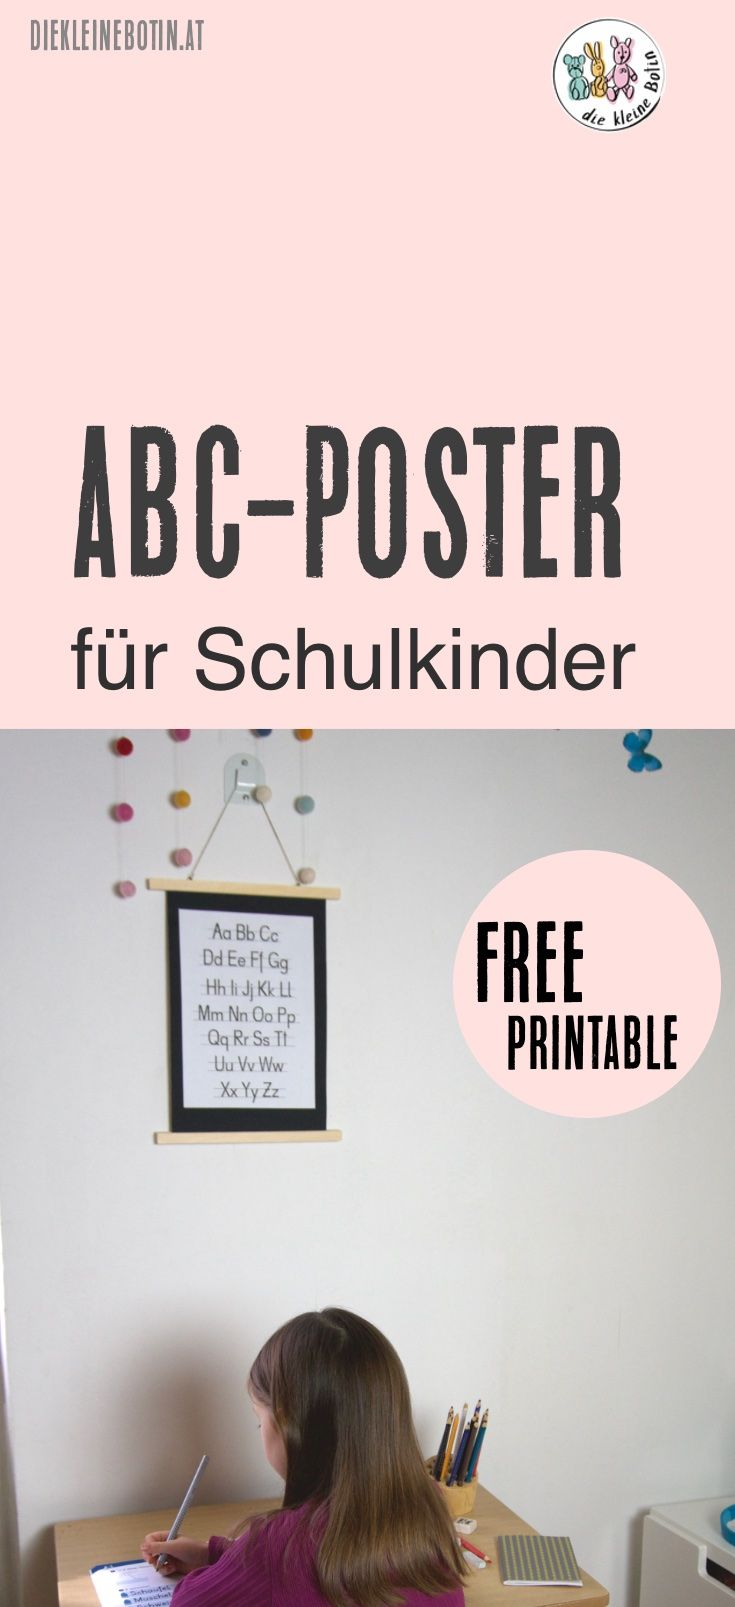 25 unique abc poster ideas on pinterest english abc. Black Bedroom Furniture Sets. Home Design Ideas